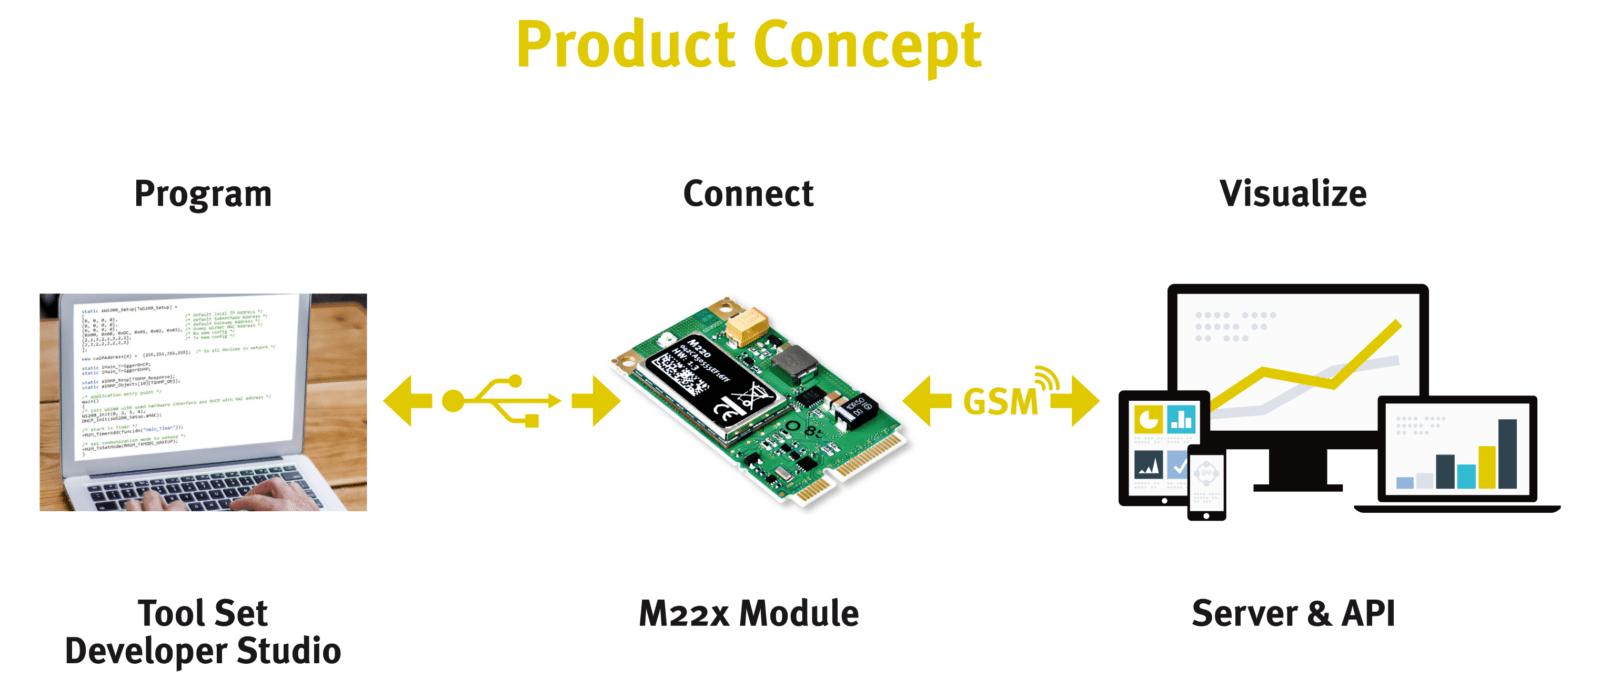 Produktkonzept - Developer Studio - M220 Module - Server & API